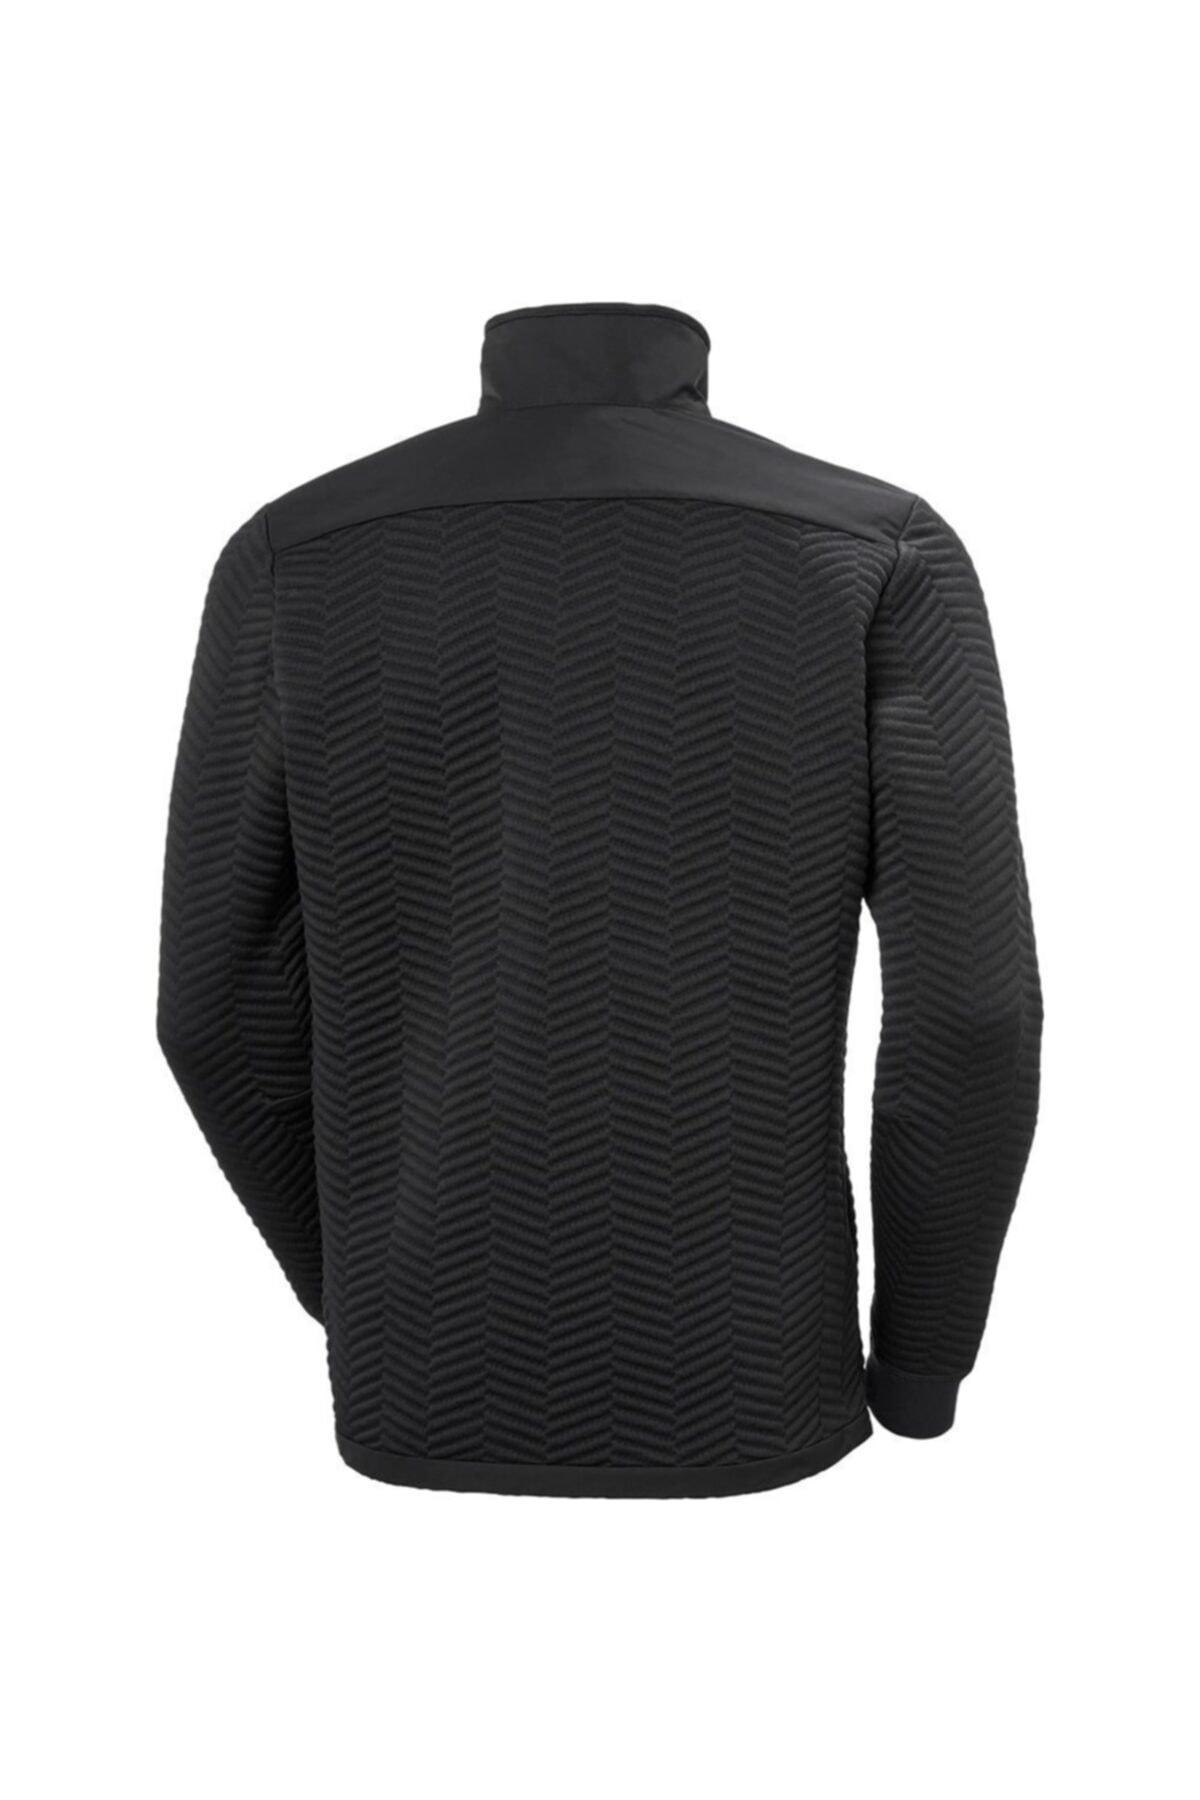 Helly Hansen Lillo Erkek Sweater 2